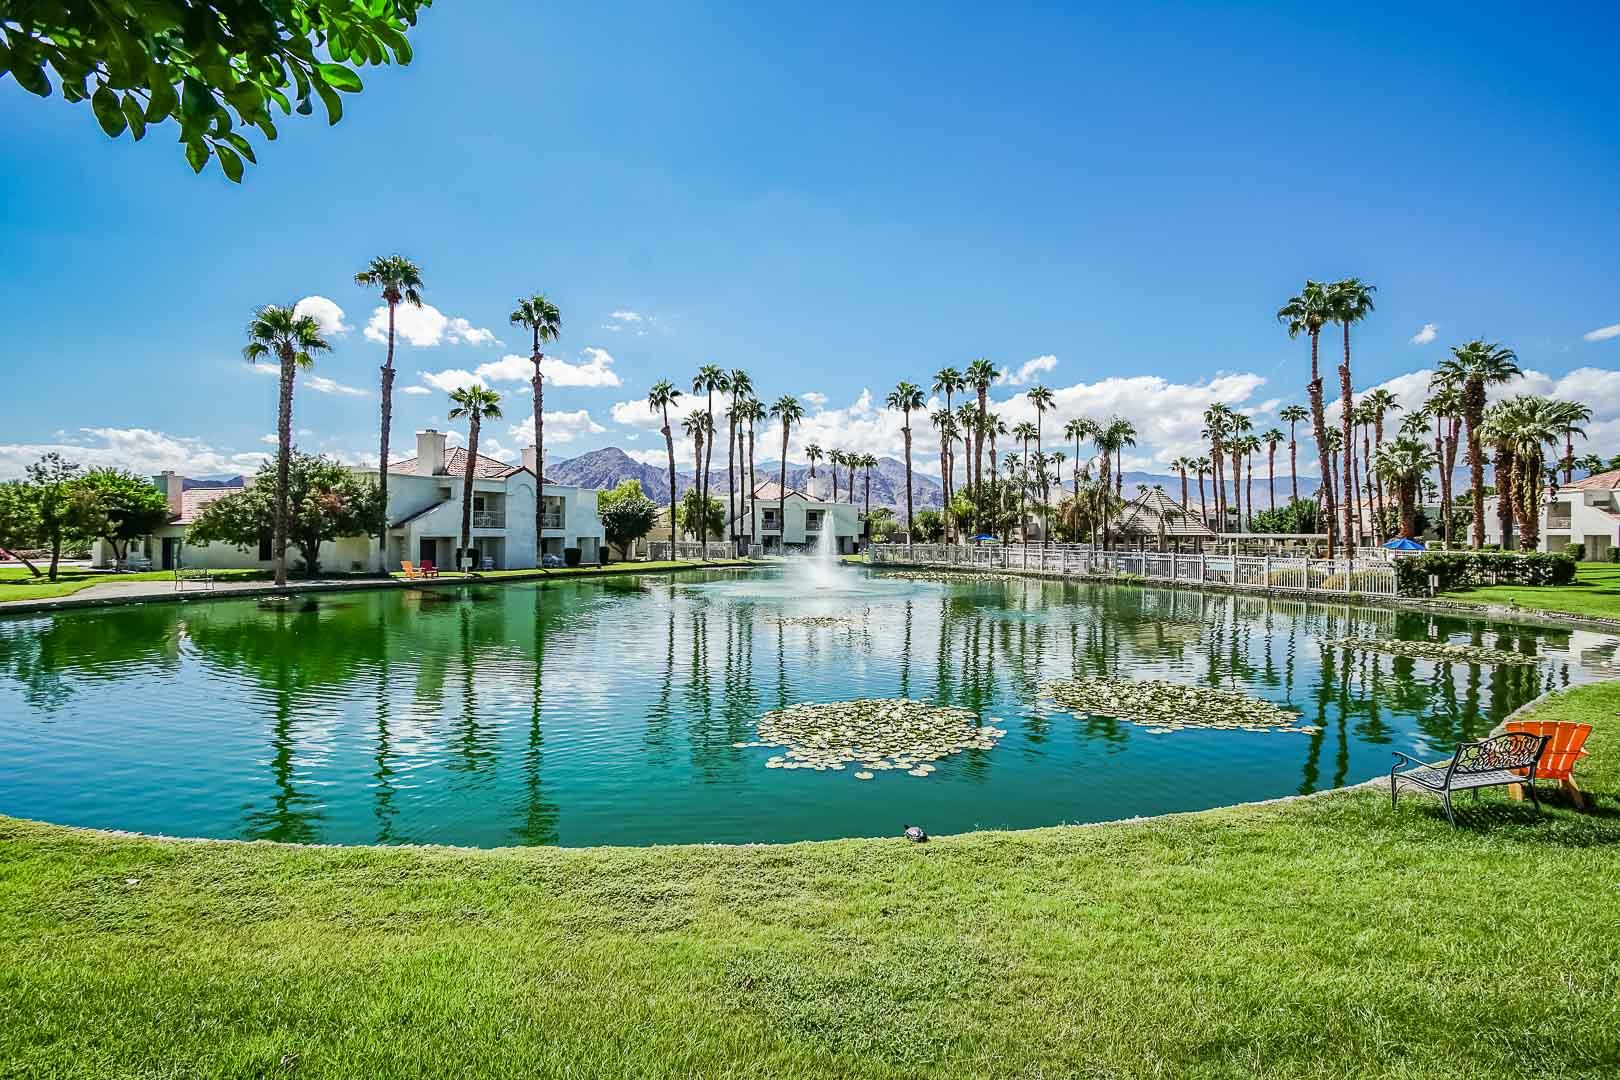 A peaceful view of the resort exterior at VRI Americas' Desert Breezes Resort in California